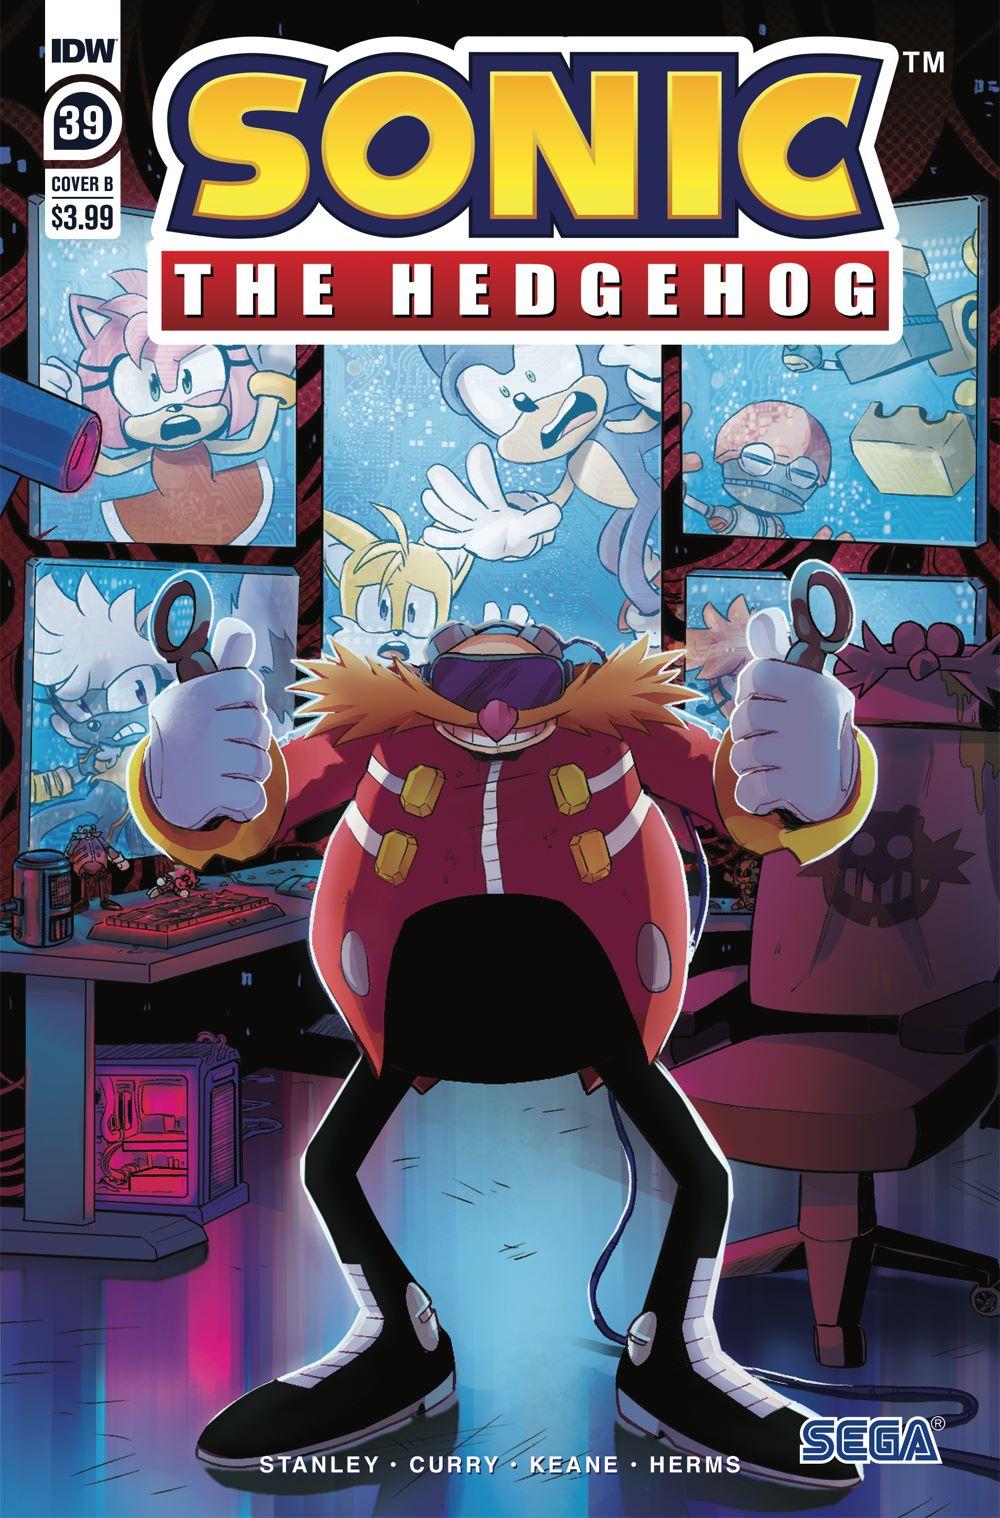 STH39_cvrB ComicList Previews: SONIC THE HEDGEHOG #39